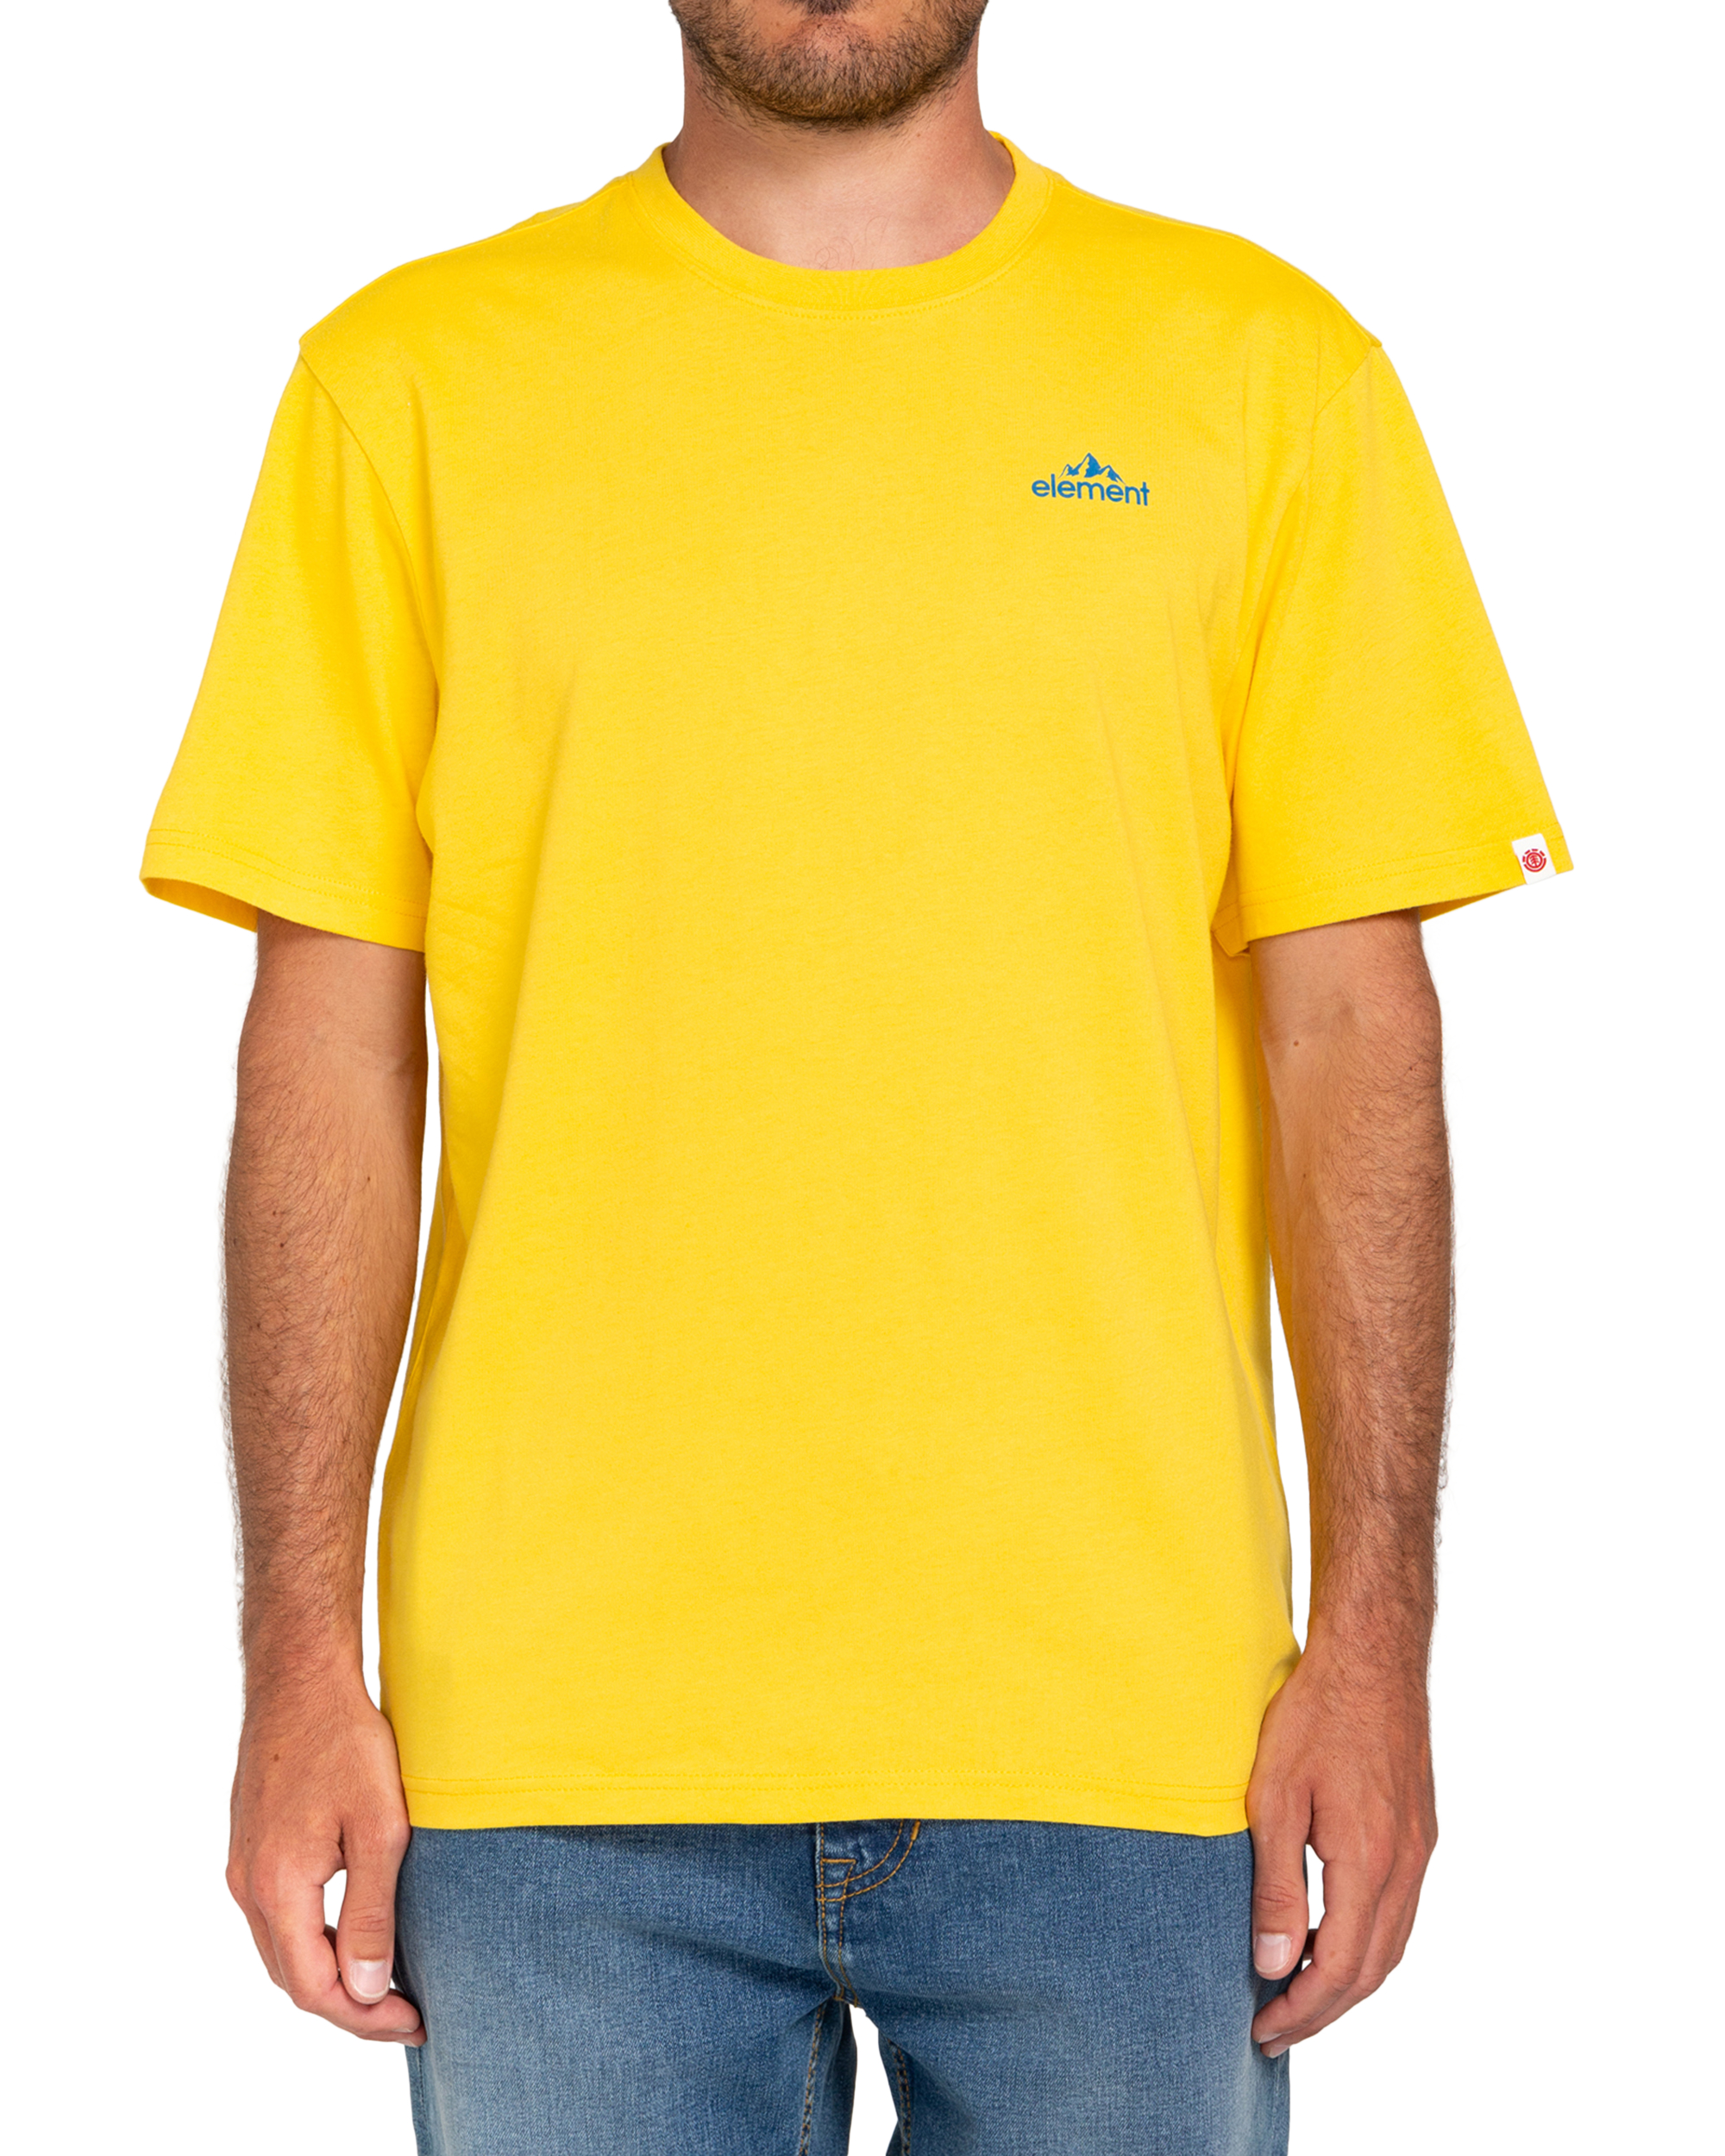 Element Duggar t-shirt, yellow, x-large